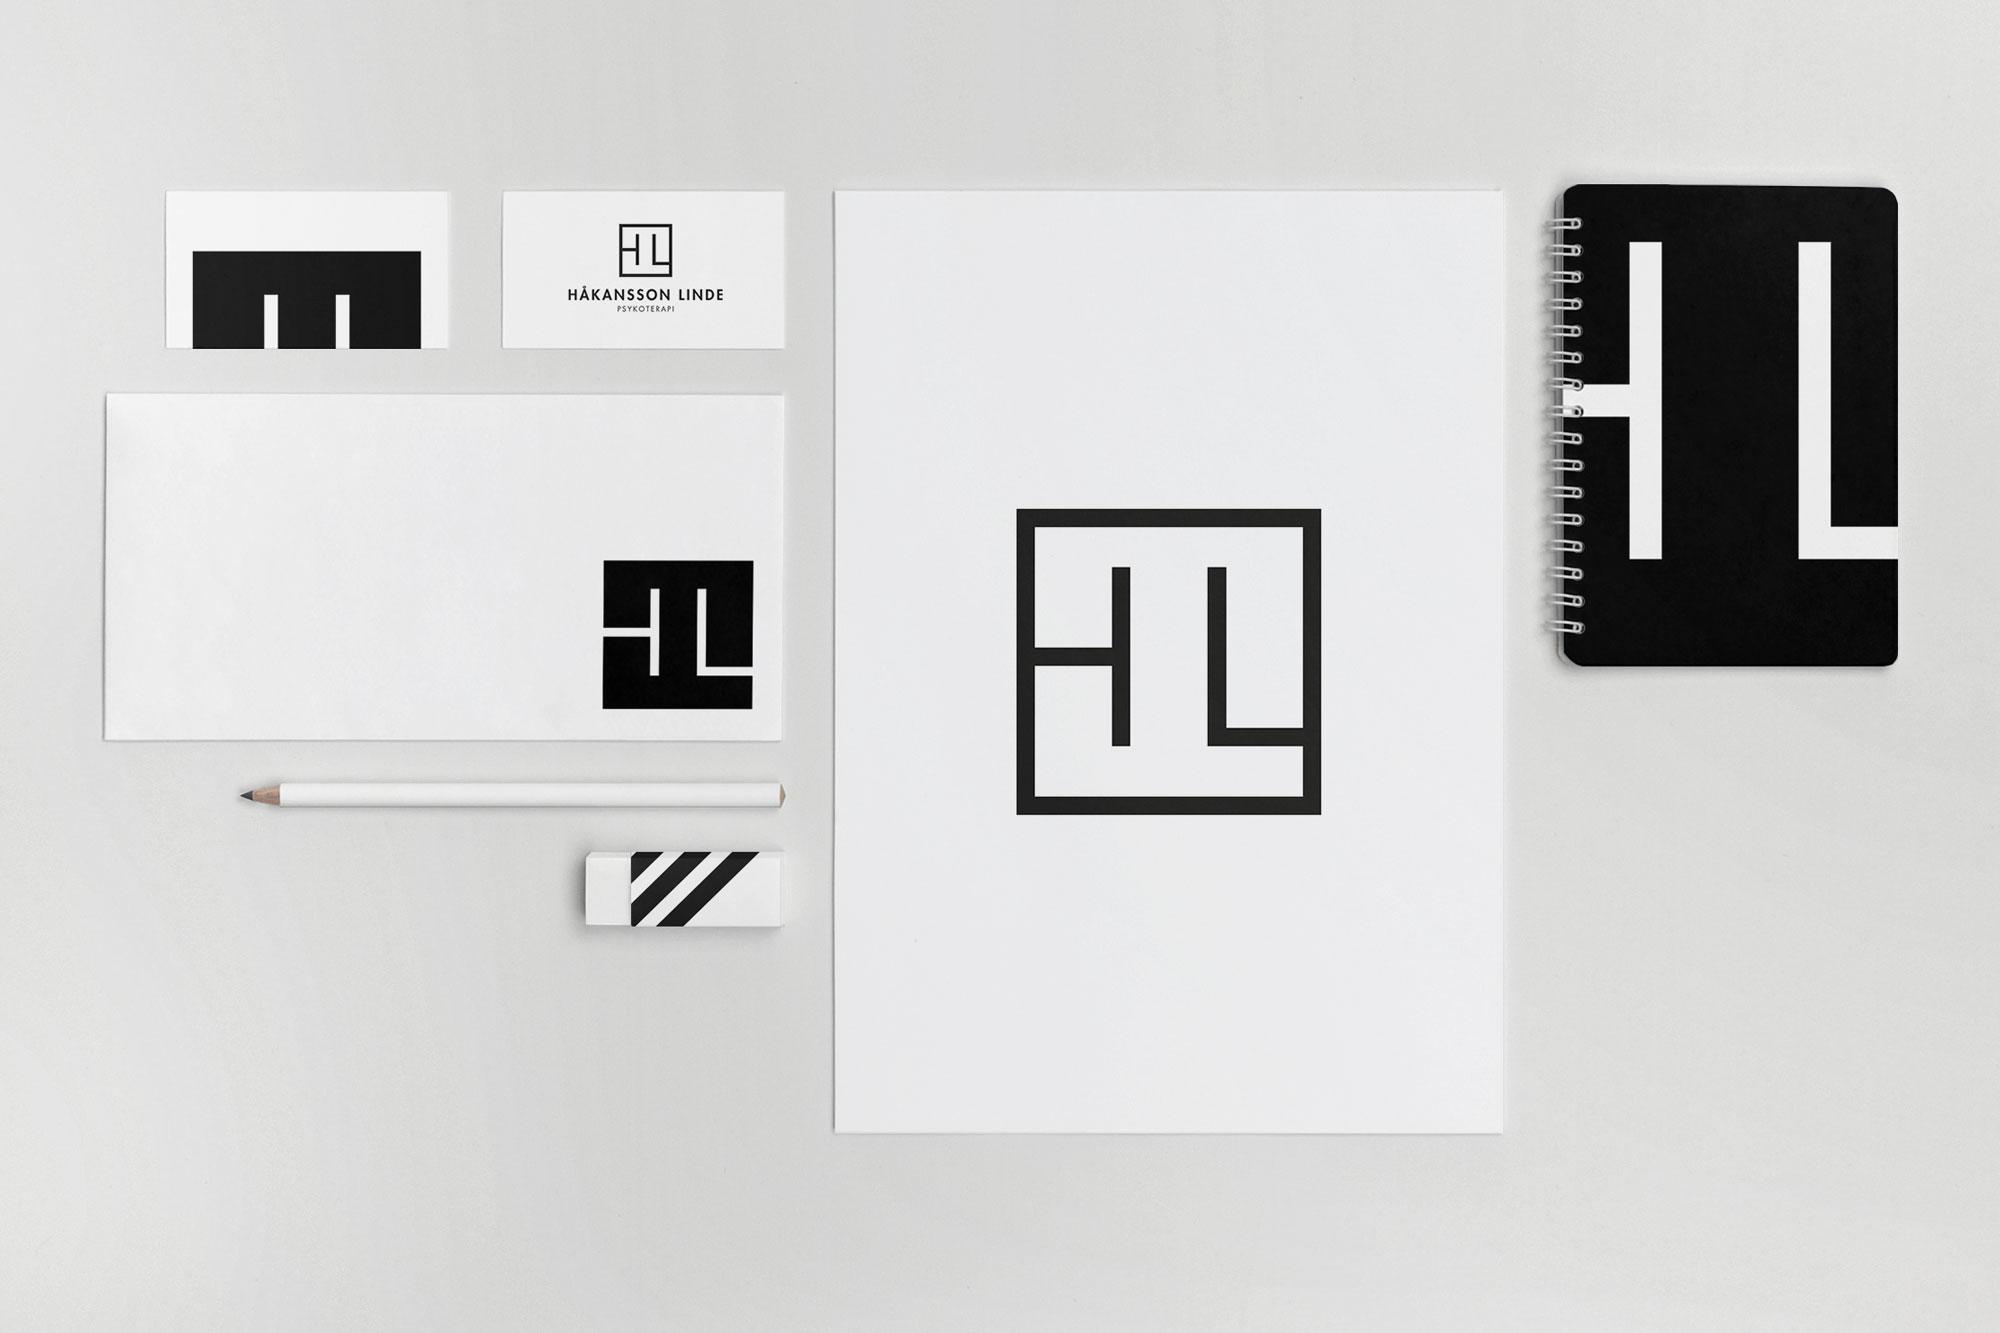 Grafisk profil / Brand identity för Håkansson Linde psykoterapi i Stockholm.